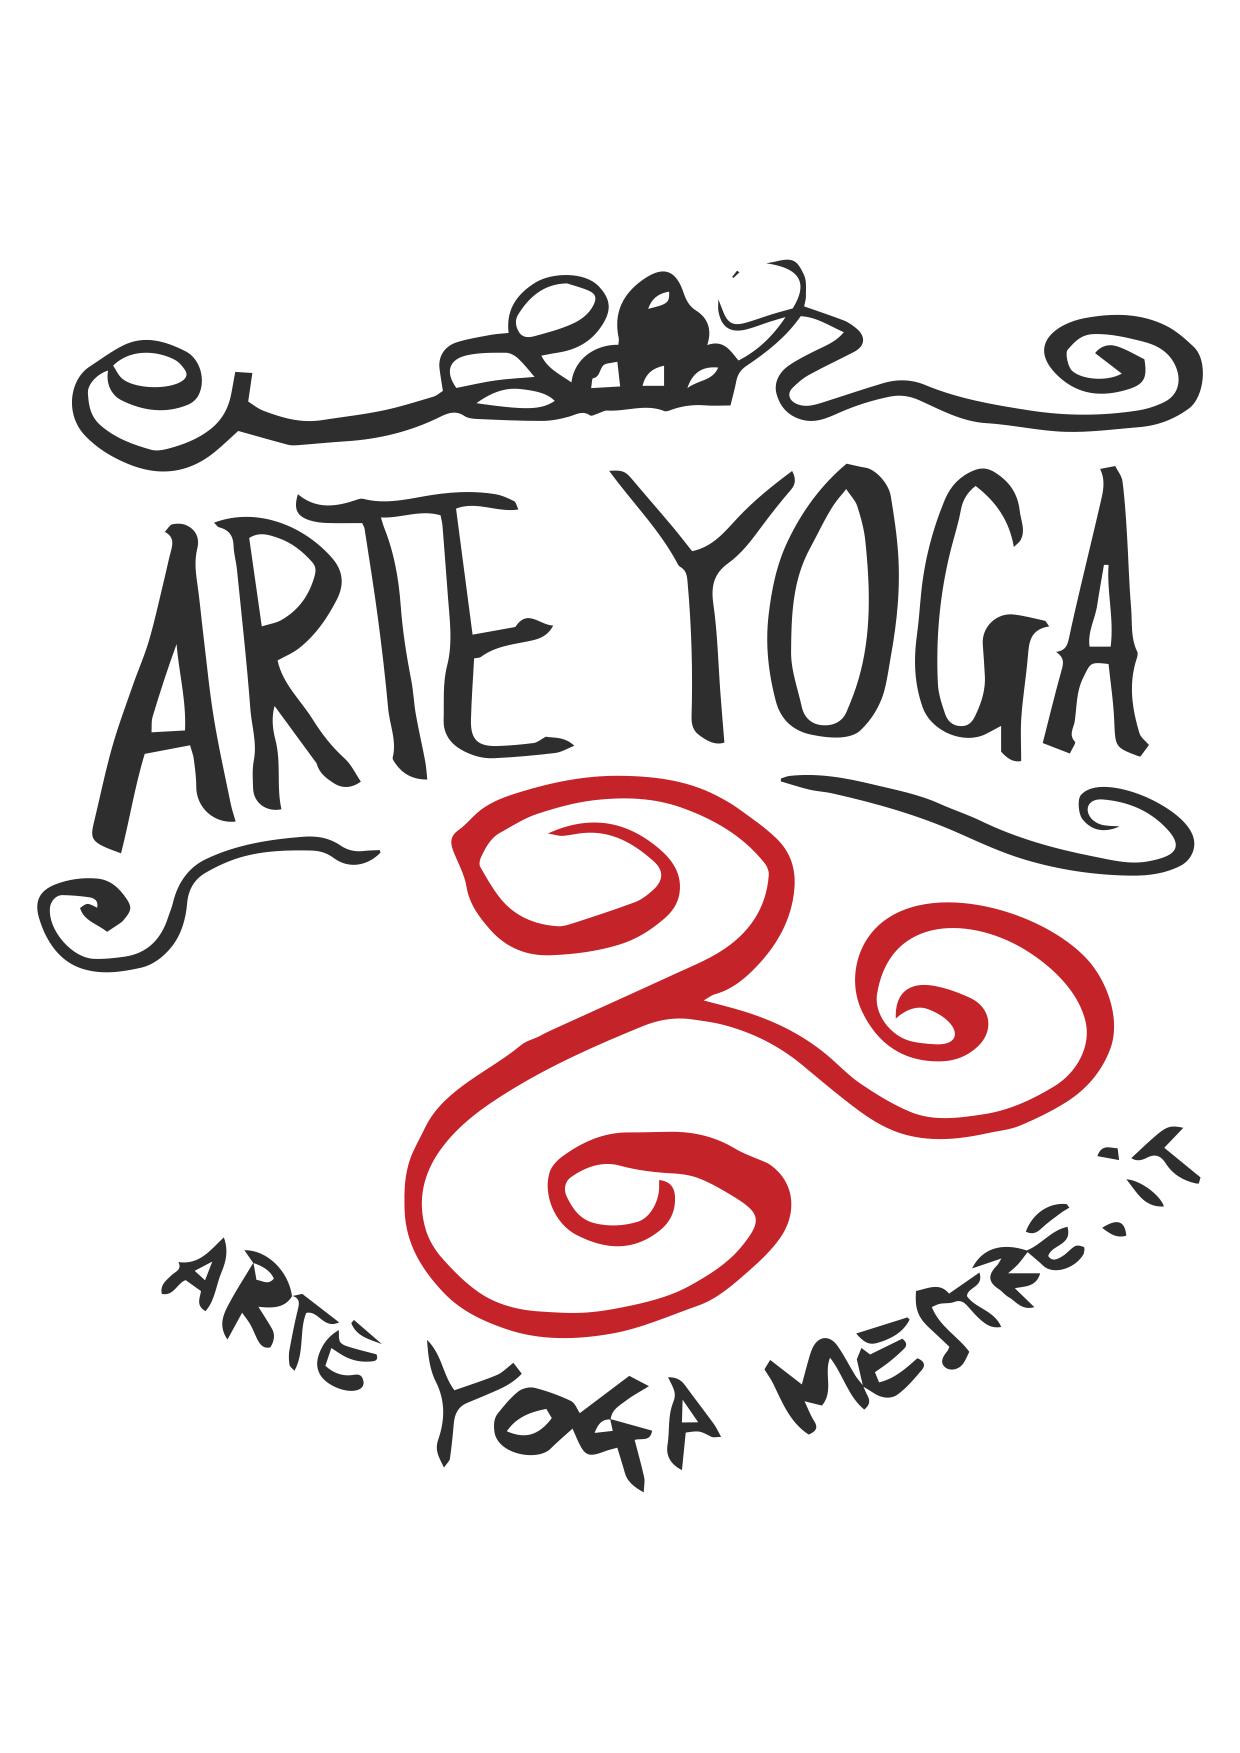 ASD Arte Yoga Mestre